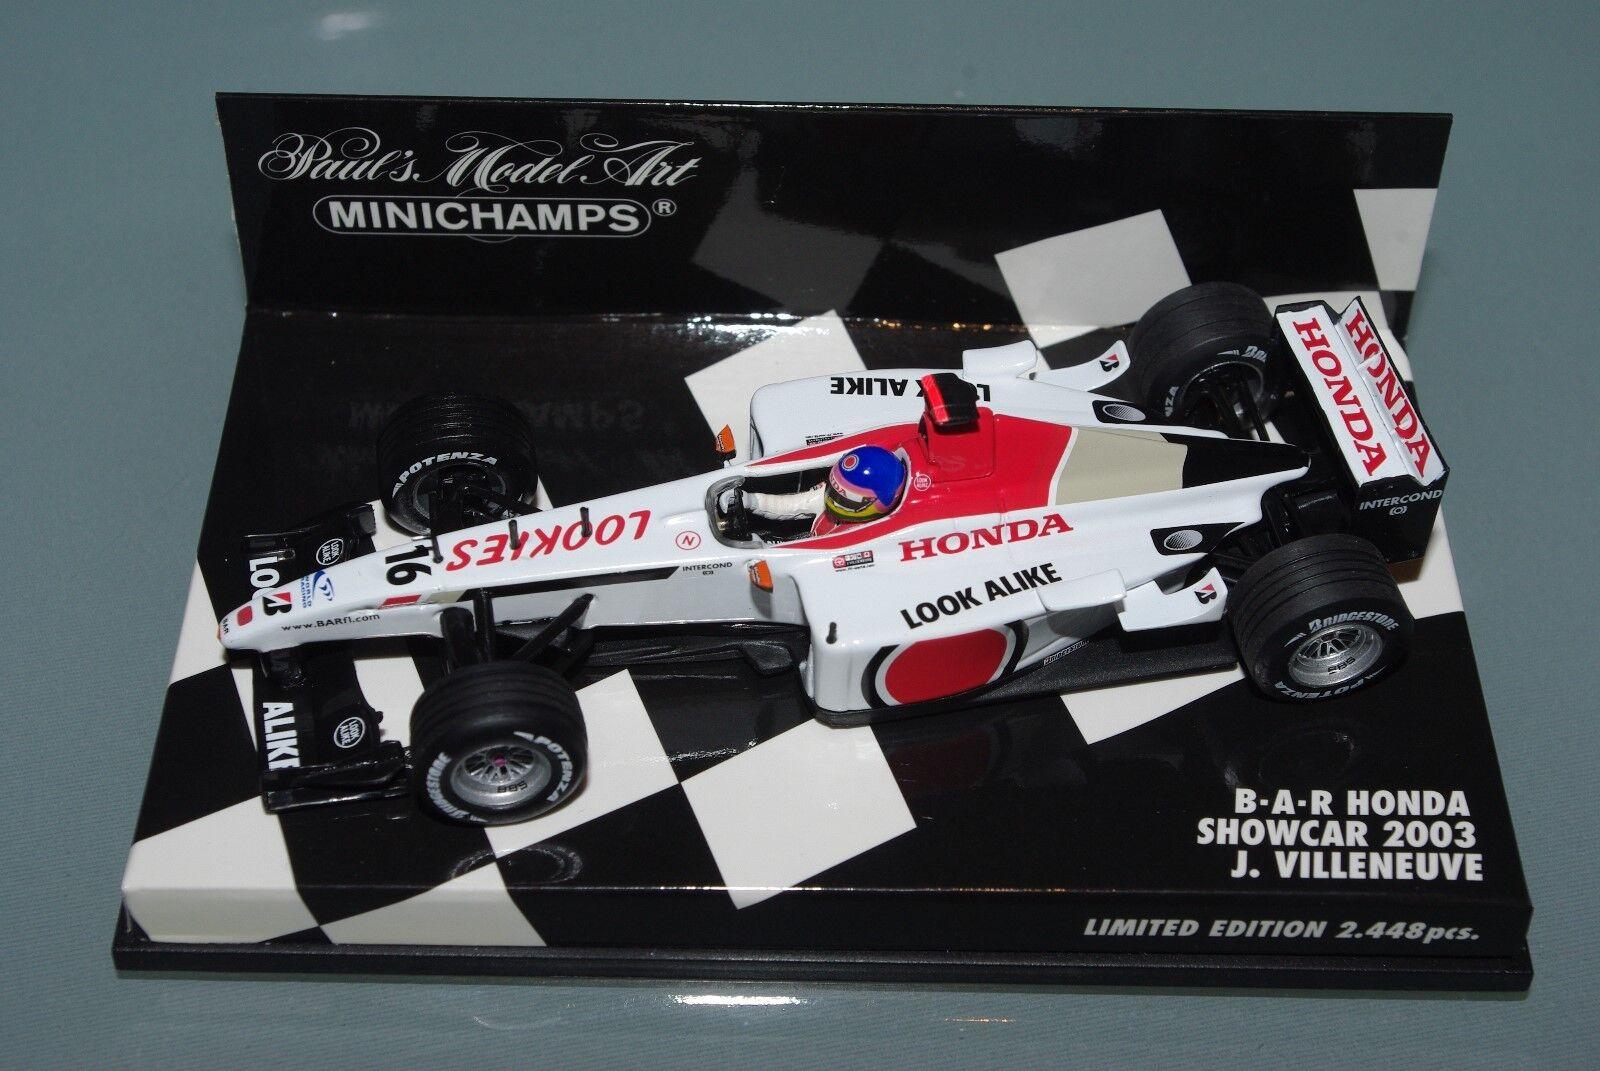 Minichamps F1 1 43 BAR HONDA SHOWCAR 2003 - JACQUES VILLENEUVE